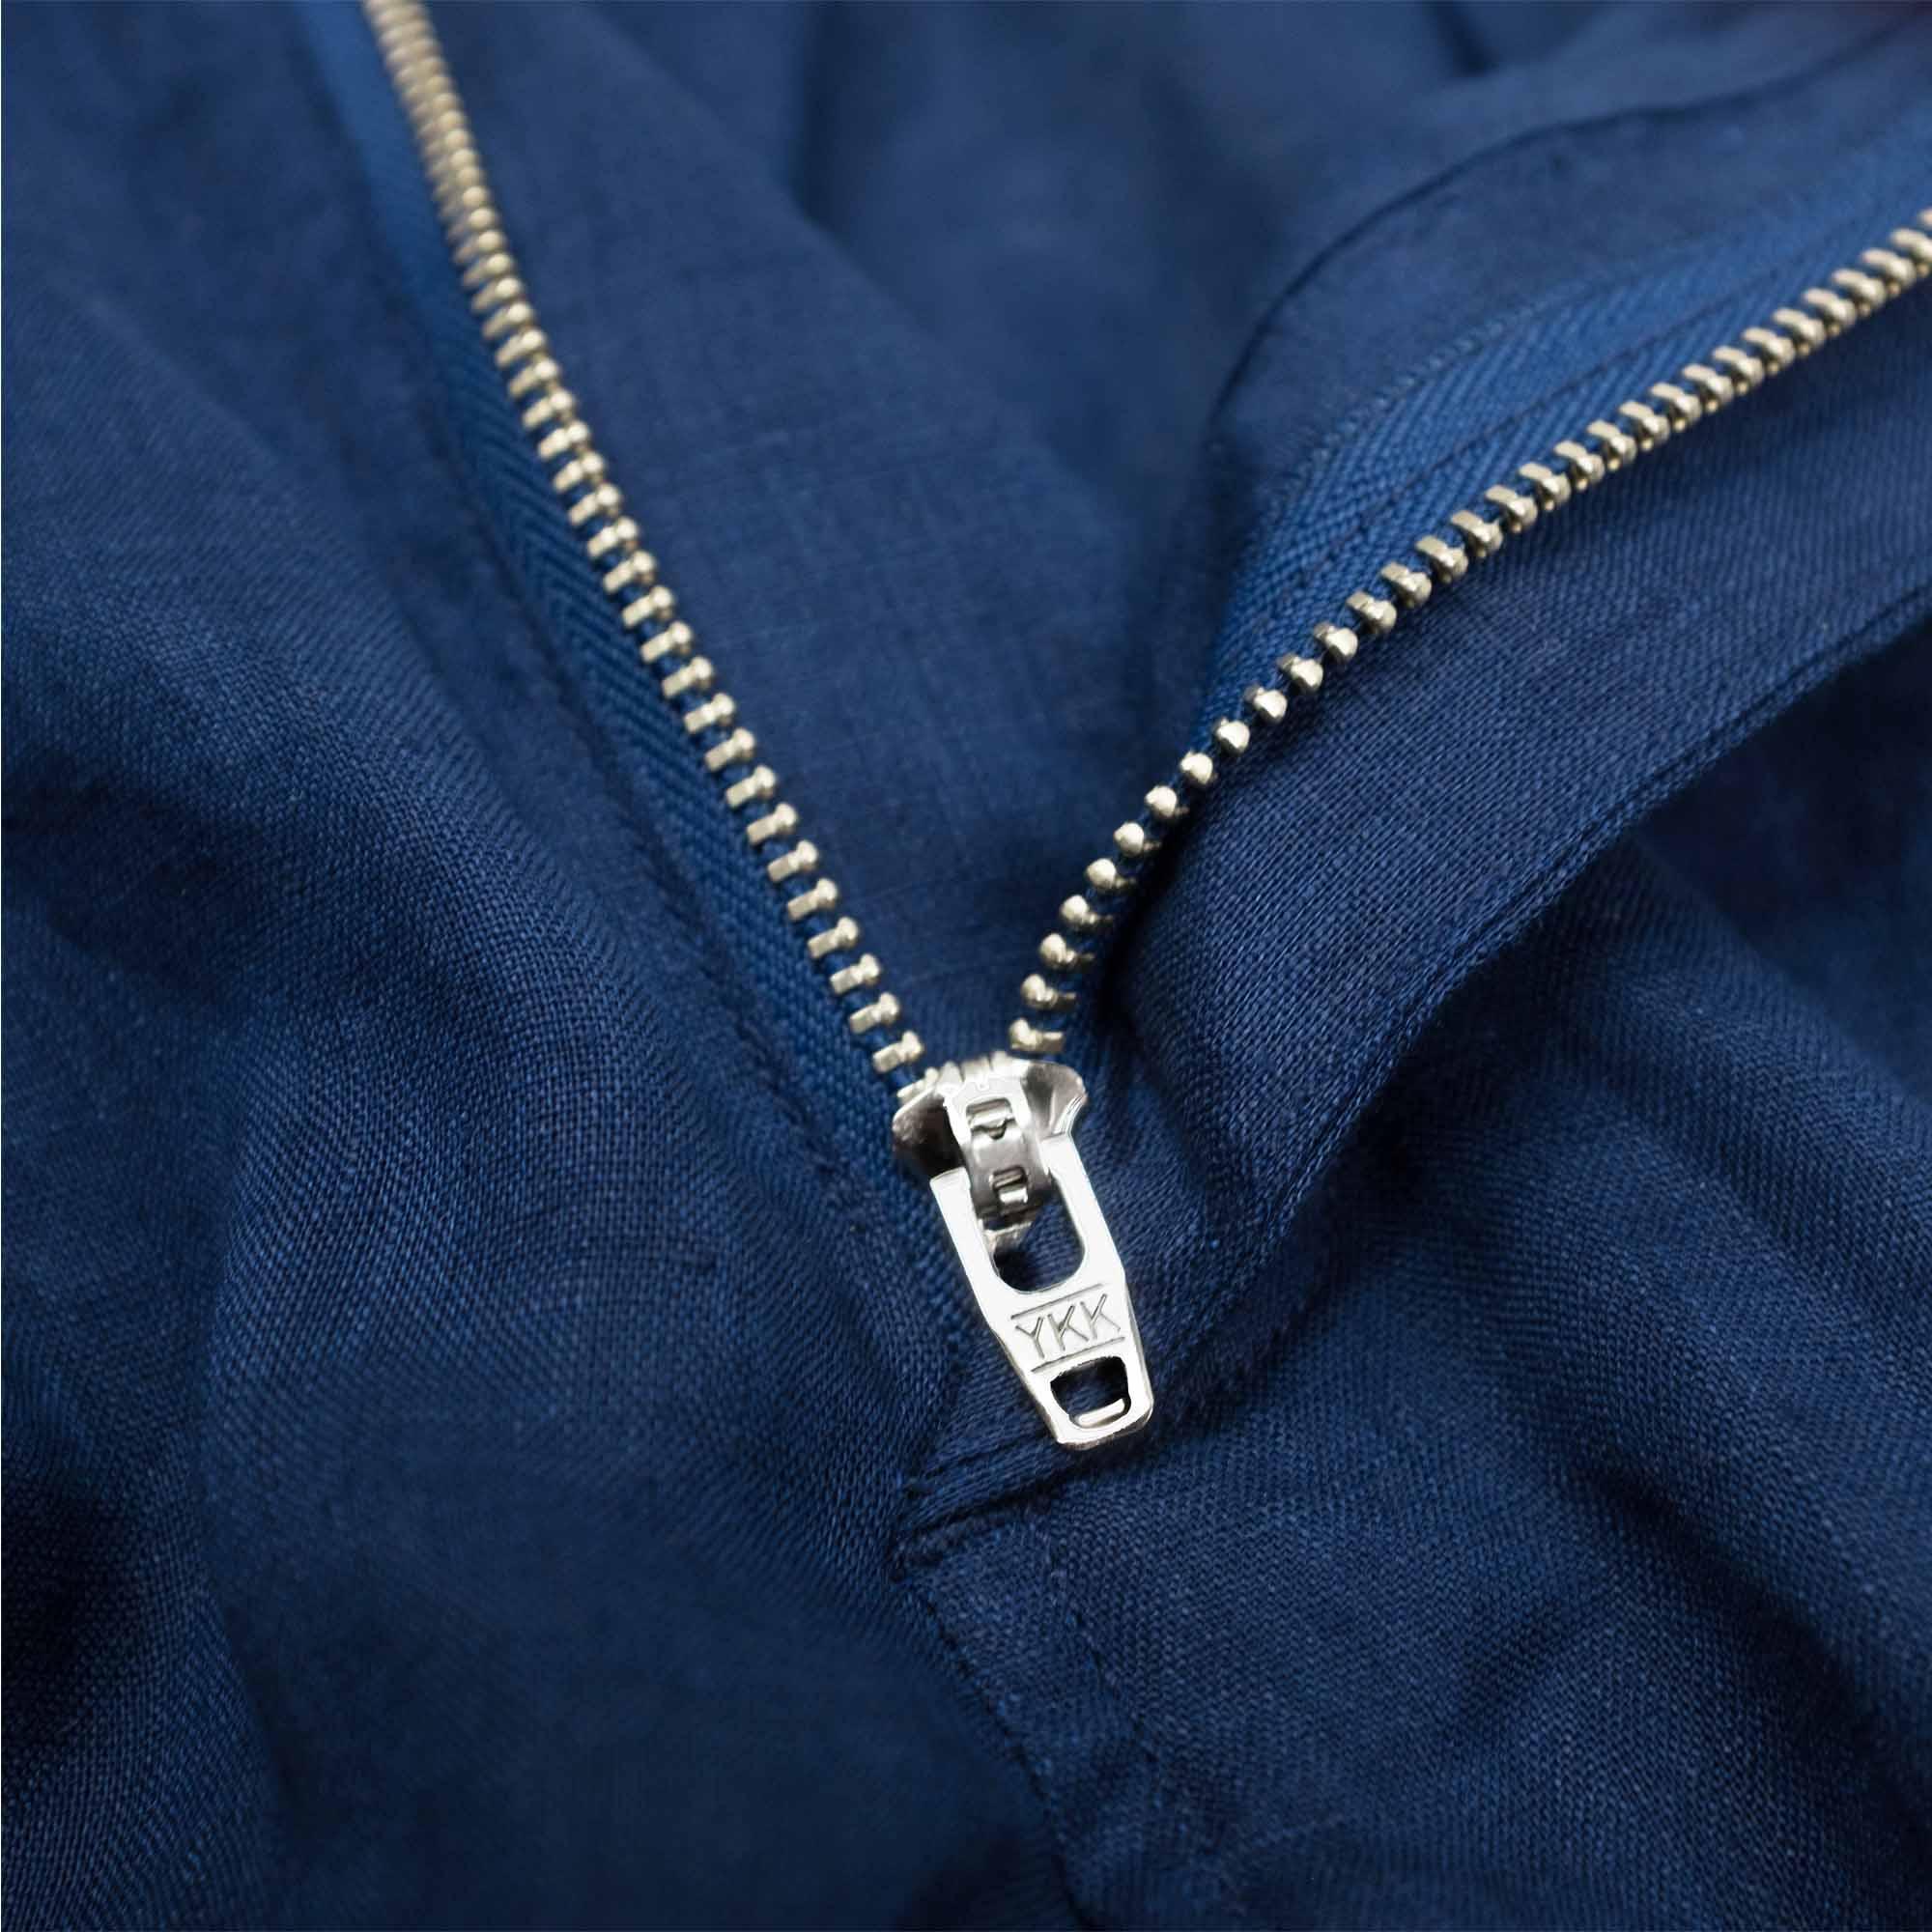 Monitaly Drop Crotch Pants - Lt Linen Navy